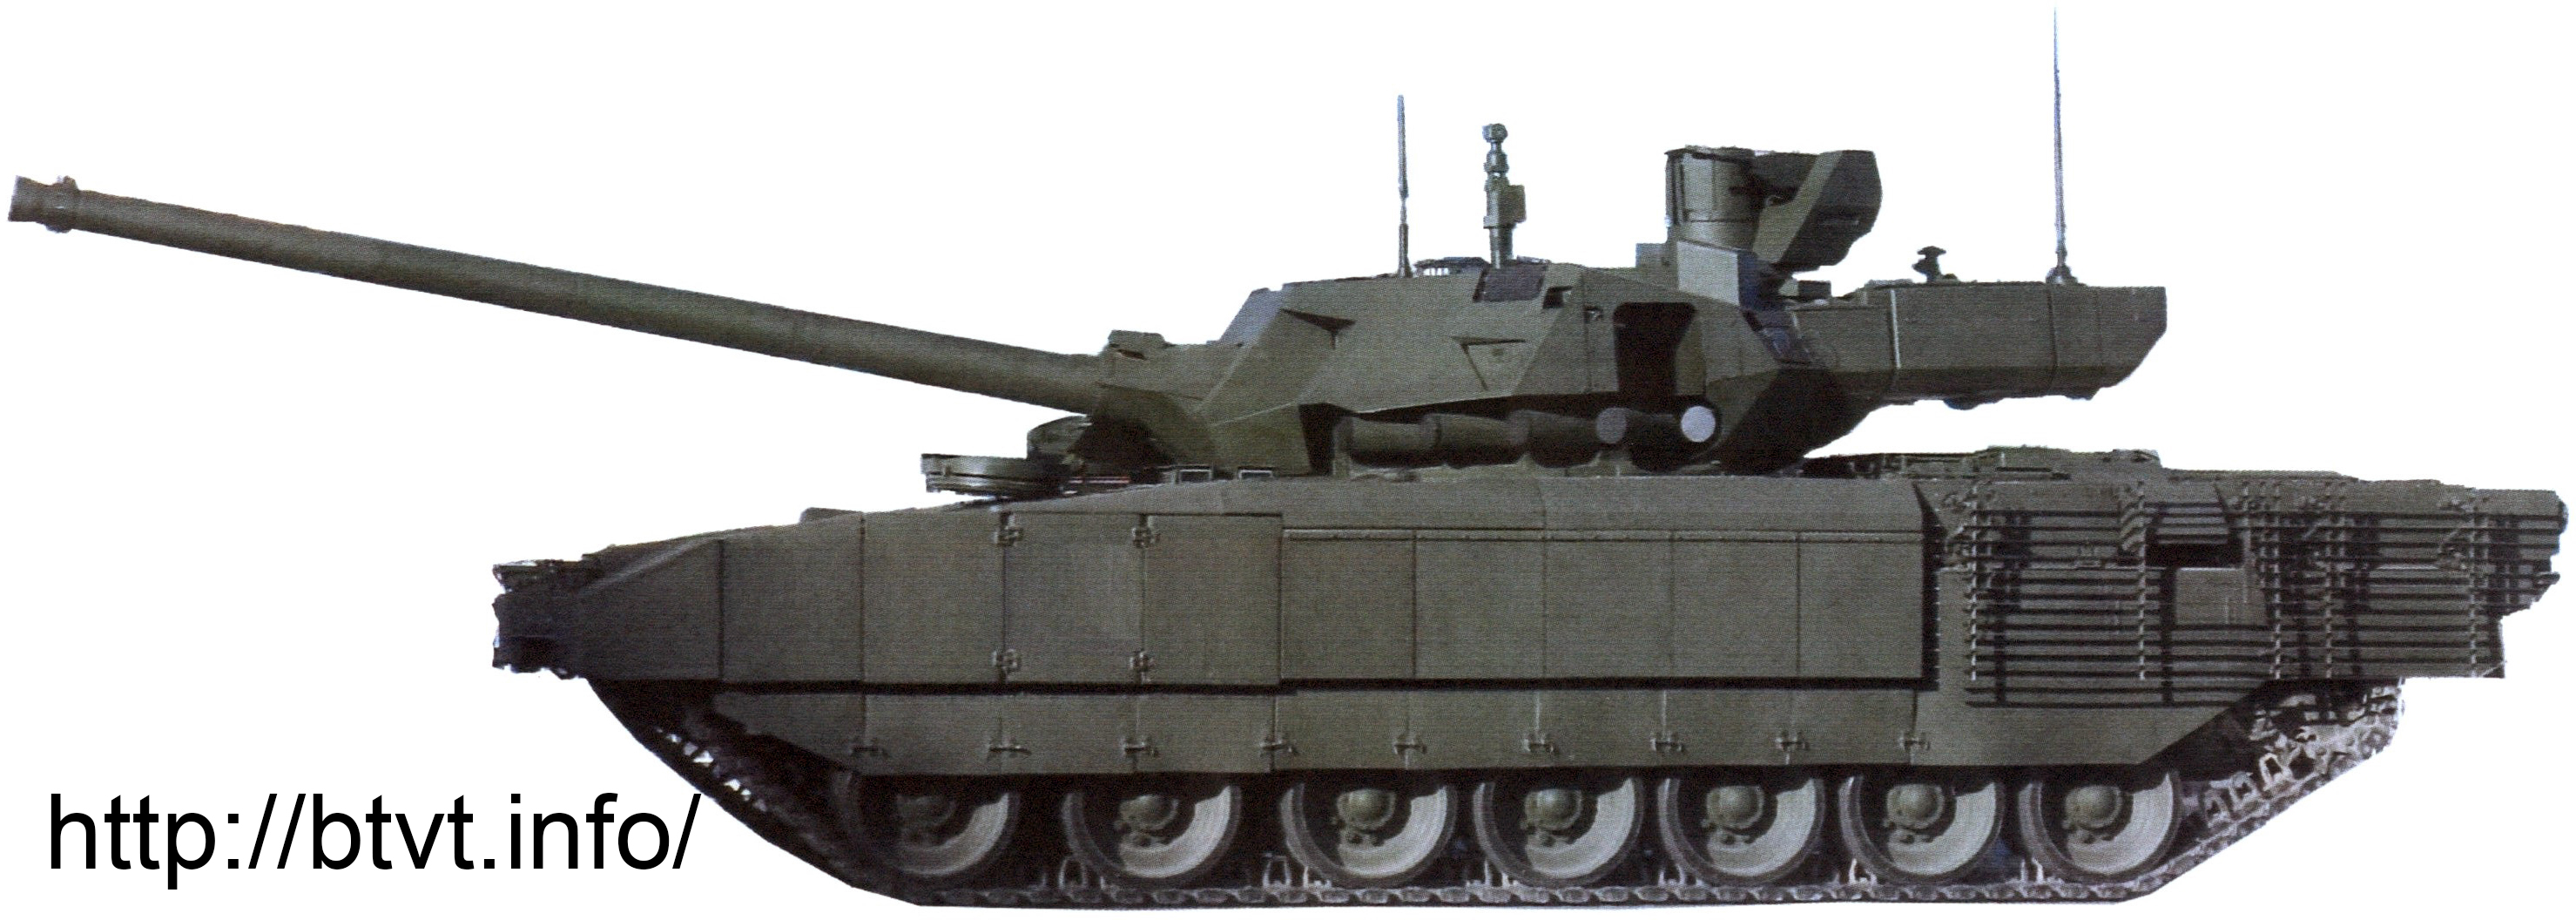 t-14-3.jpg